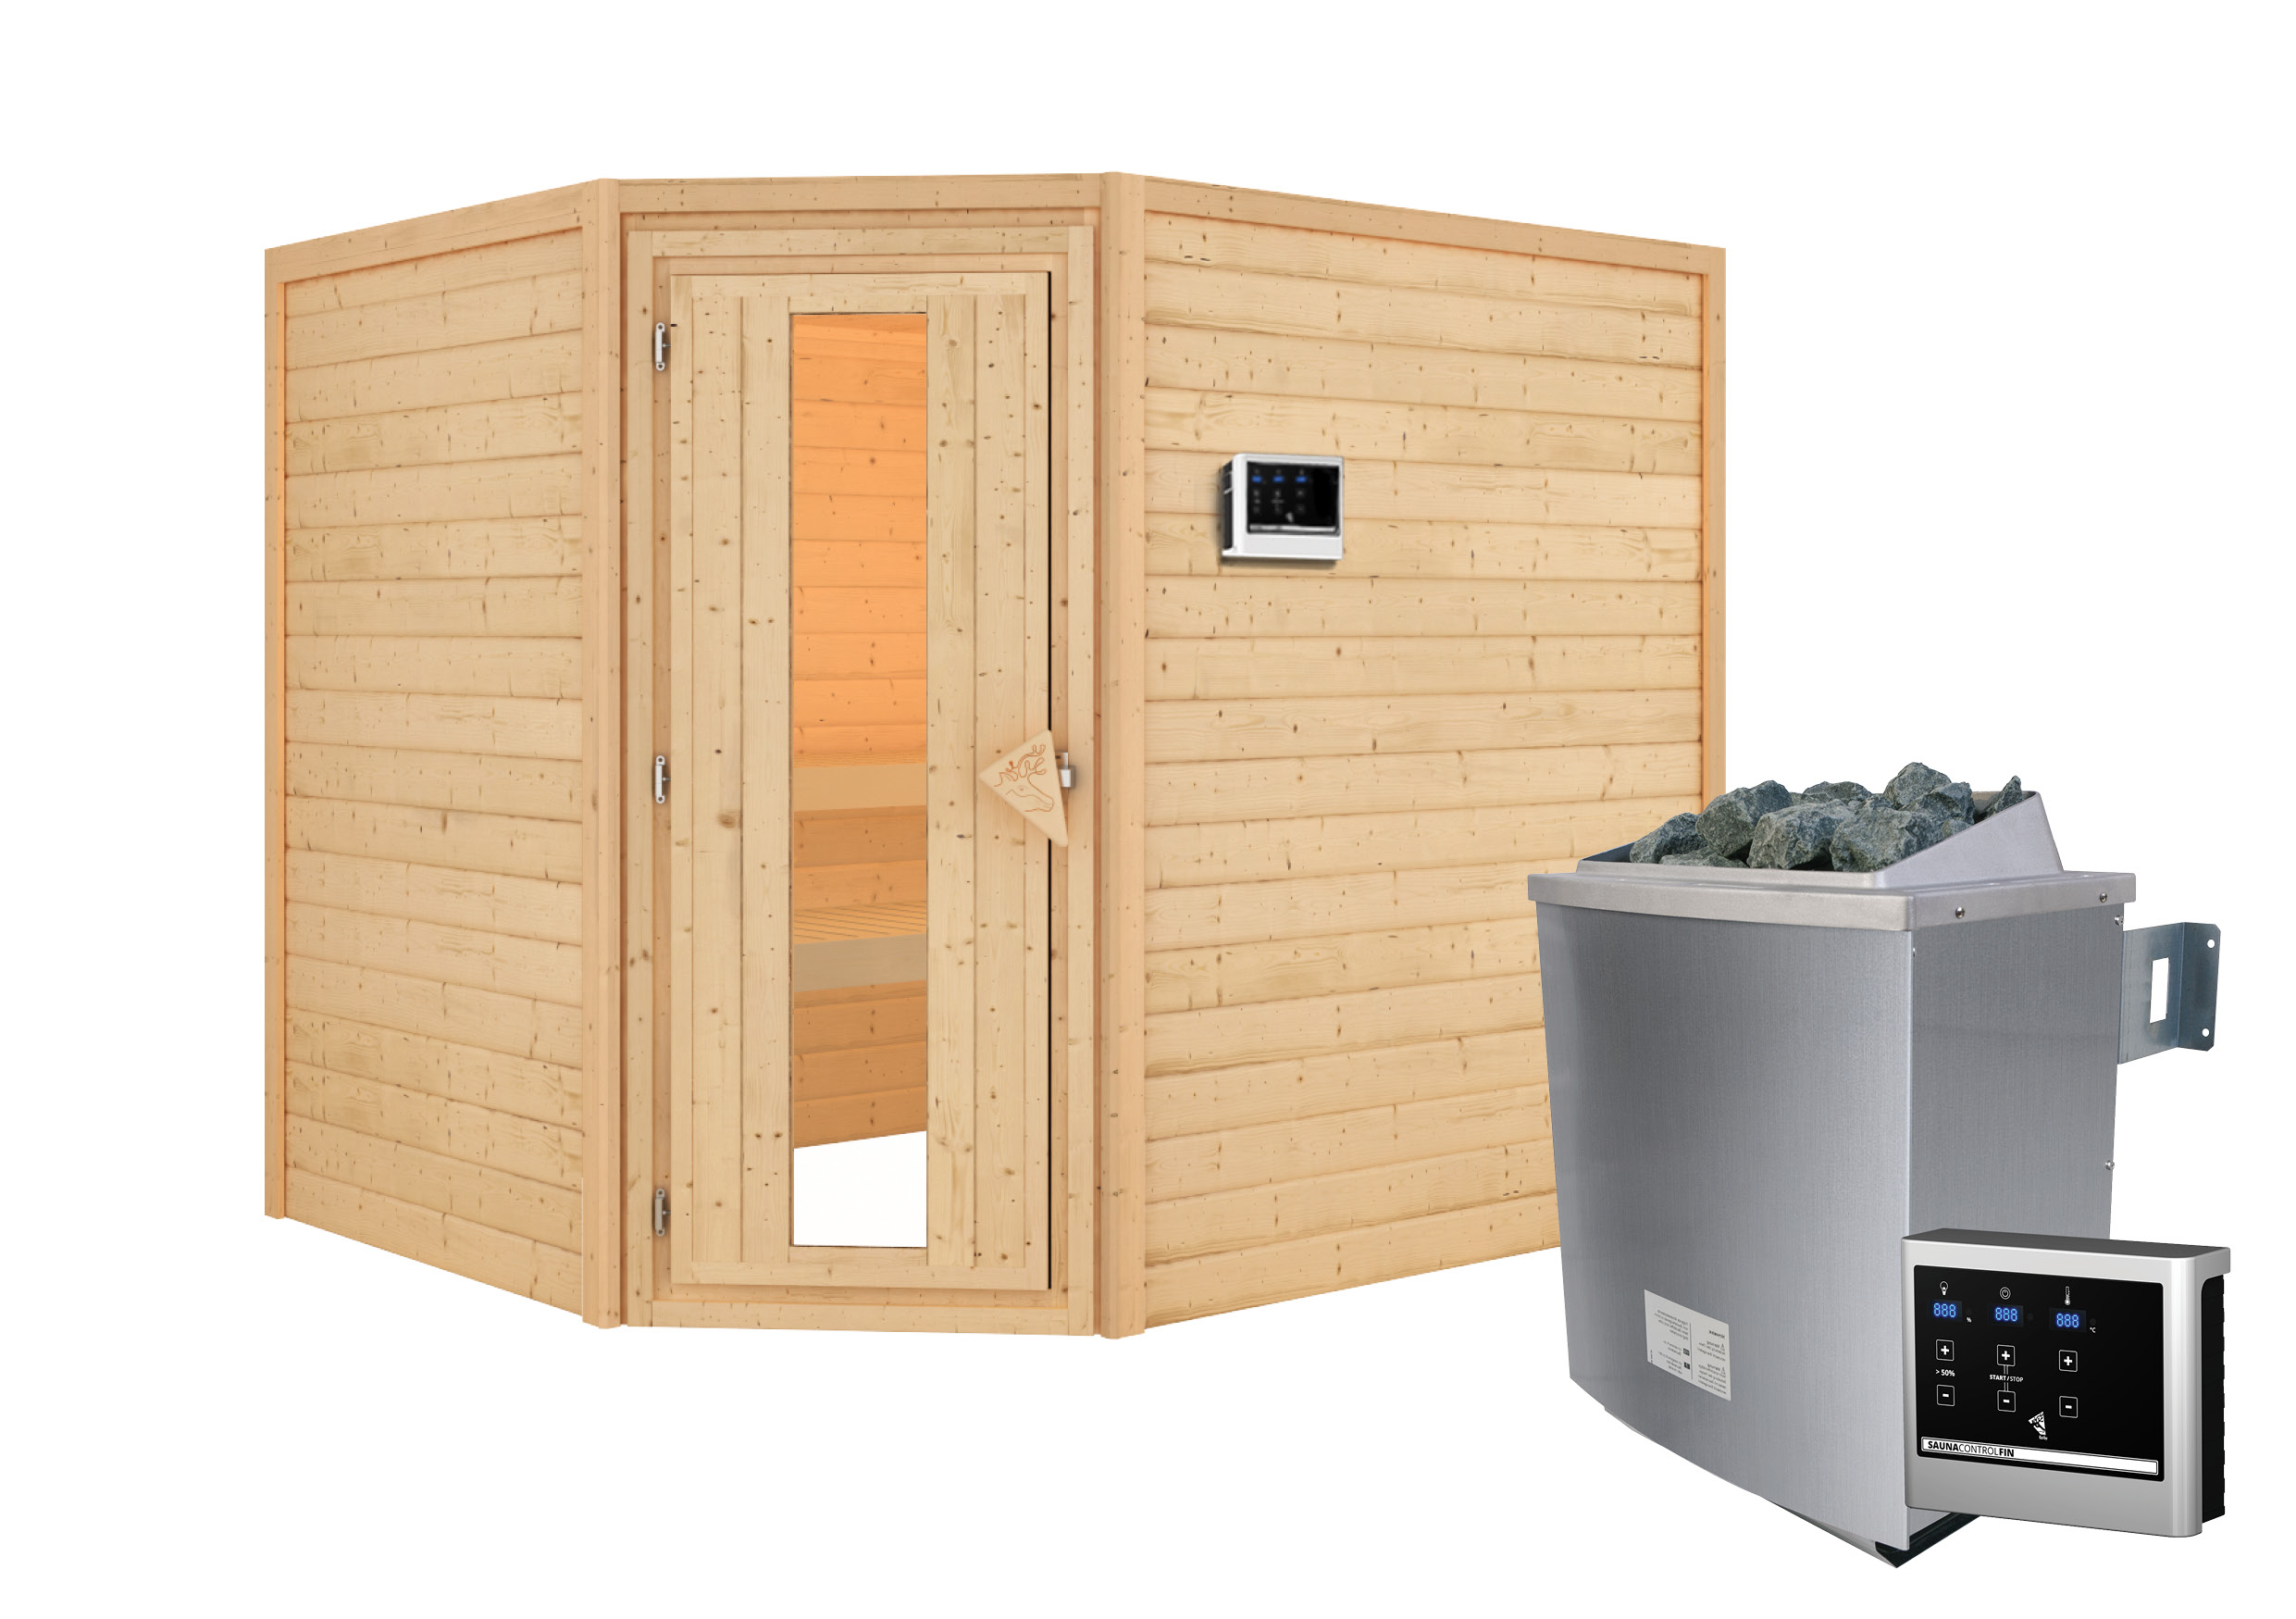 Woodfeeling Sauna Lisa 38mm Ofen 9kW extern Tür Holz Bild 4